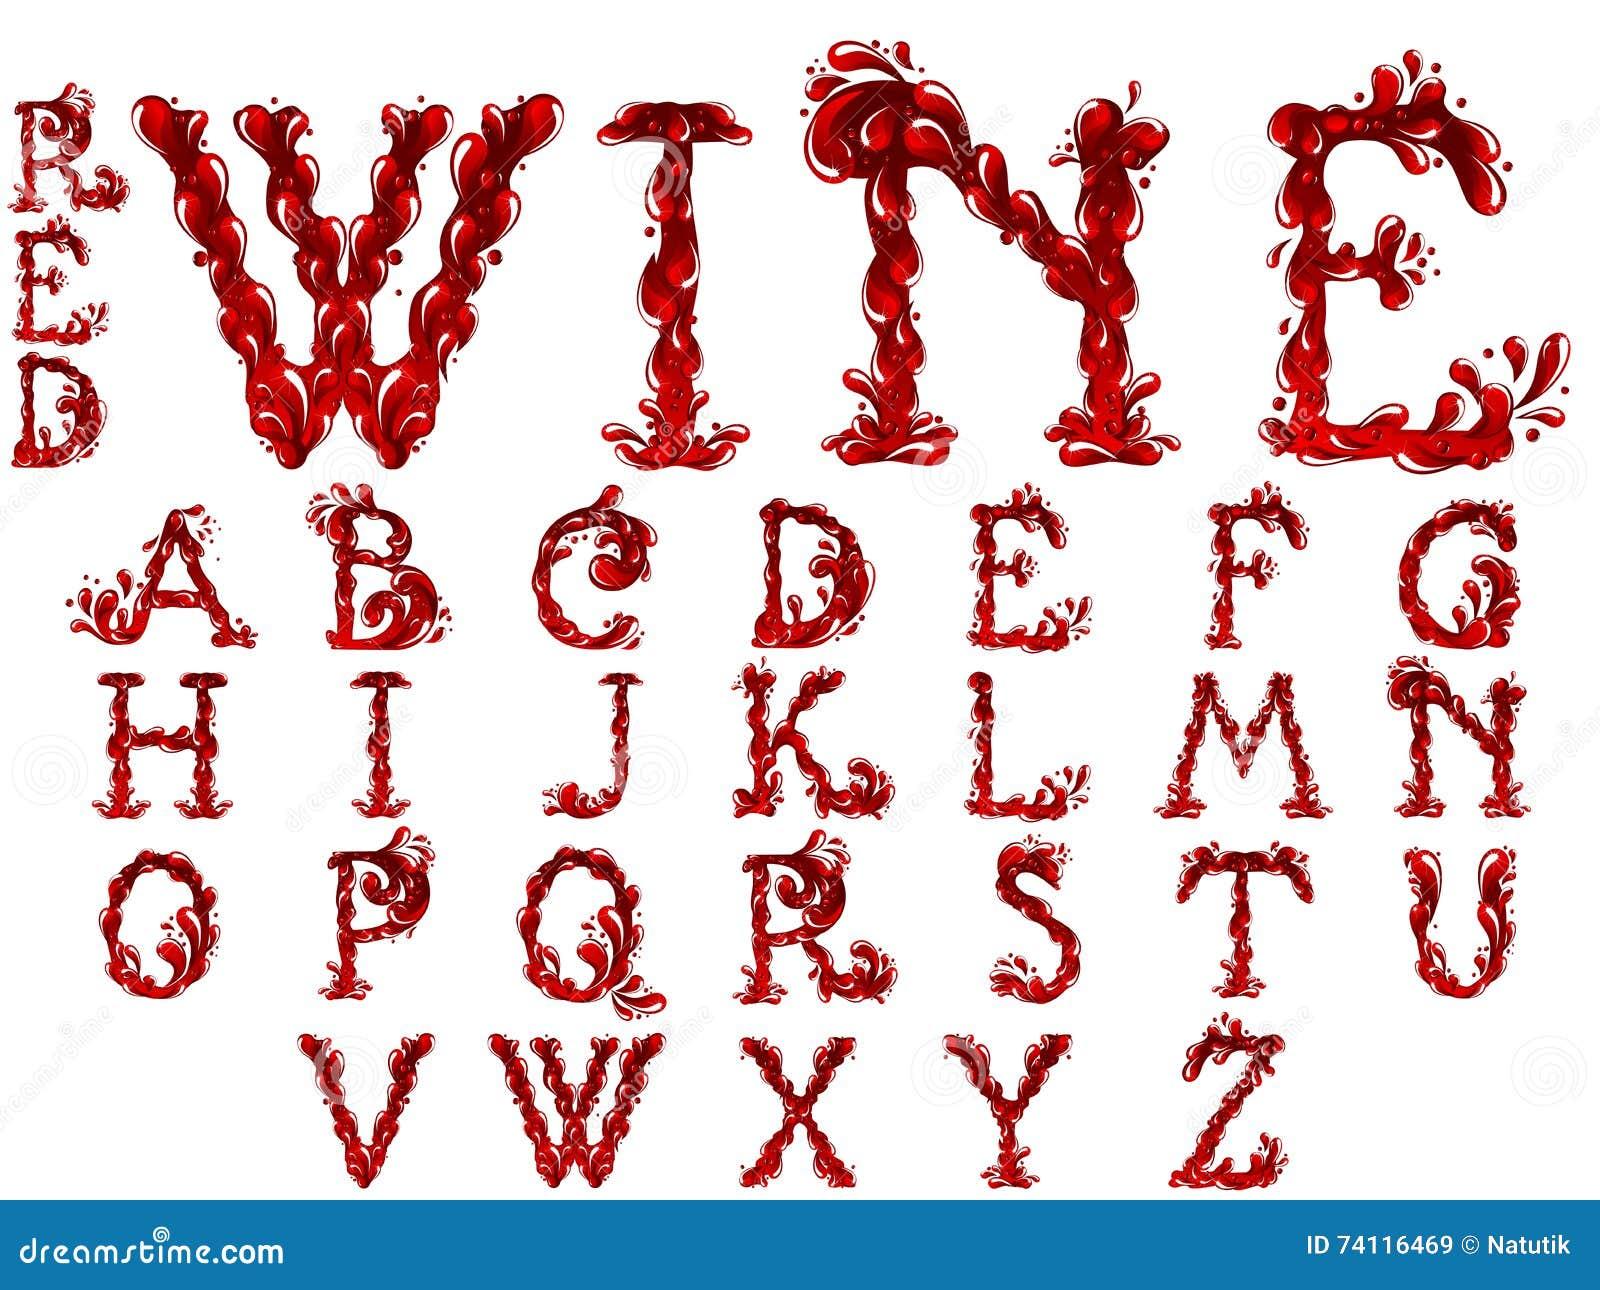 Strawberry Letters Alphabet Stock Illustrations – 103 Strawberry ...